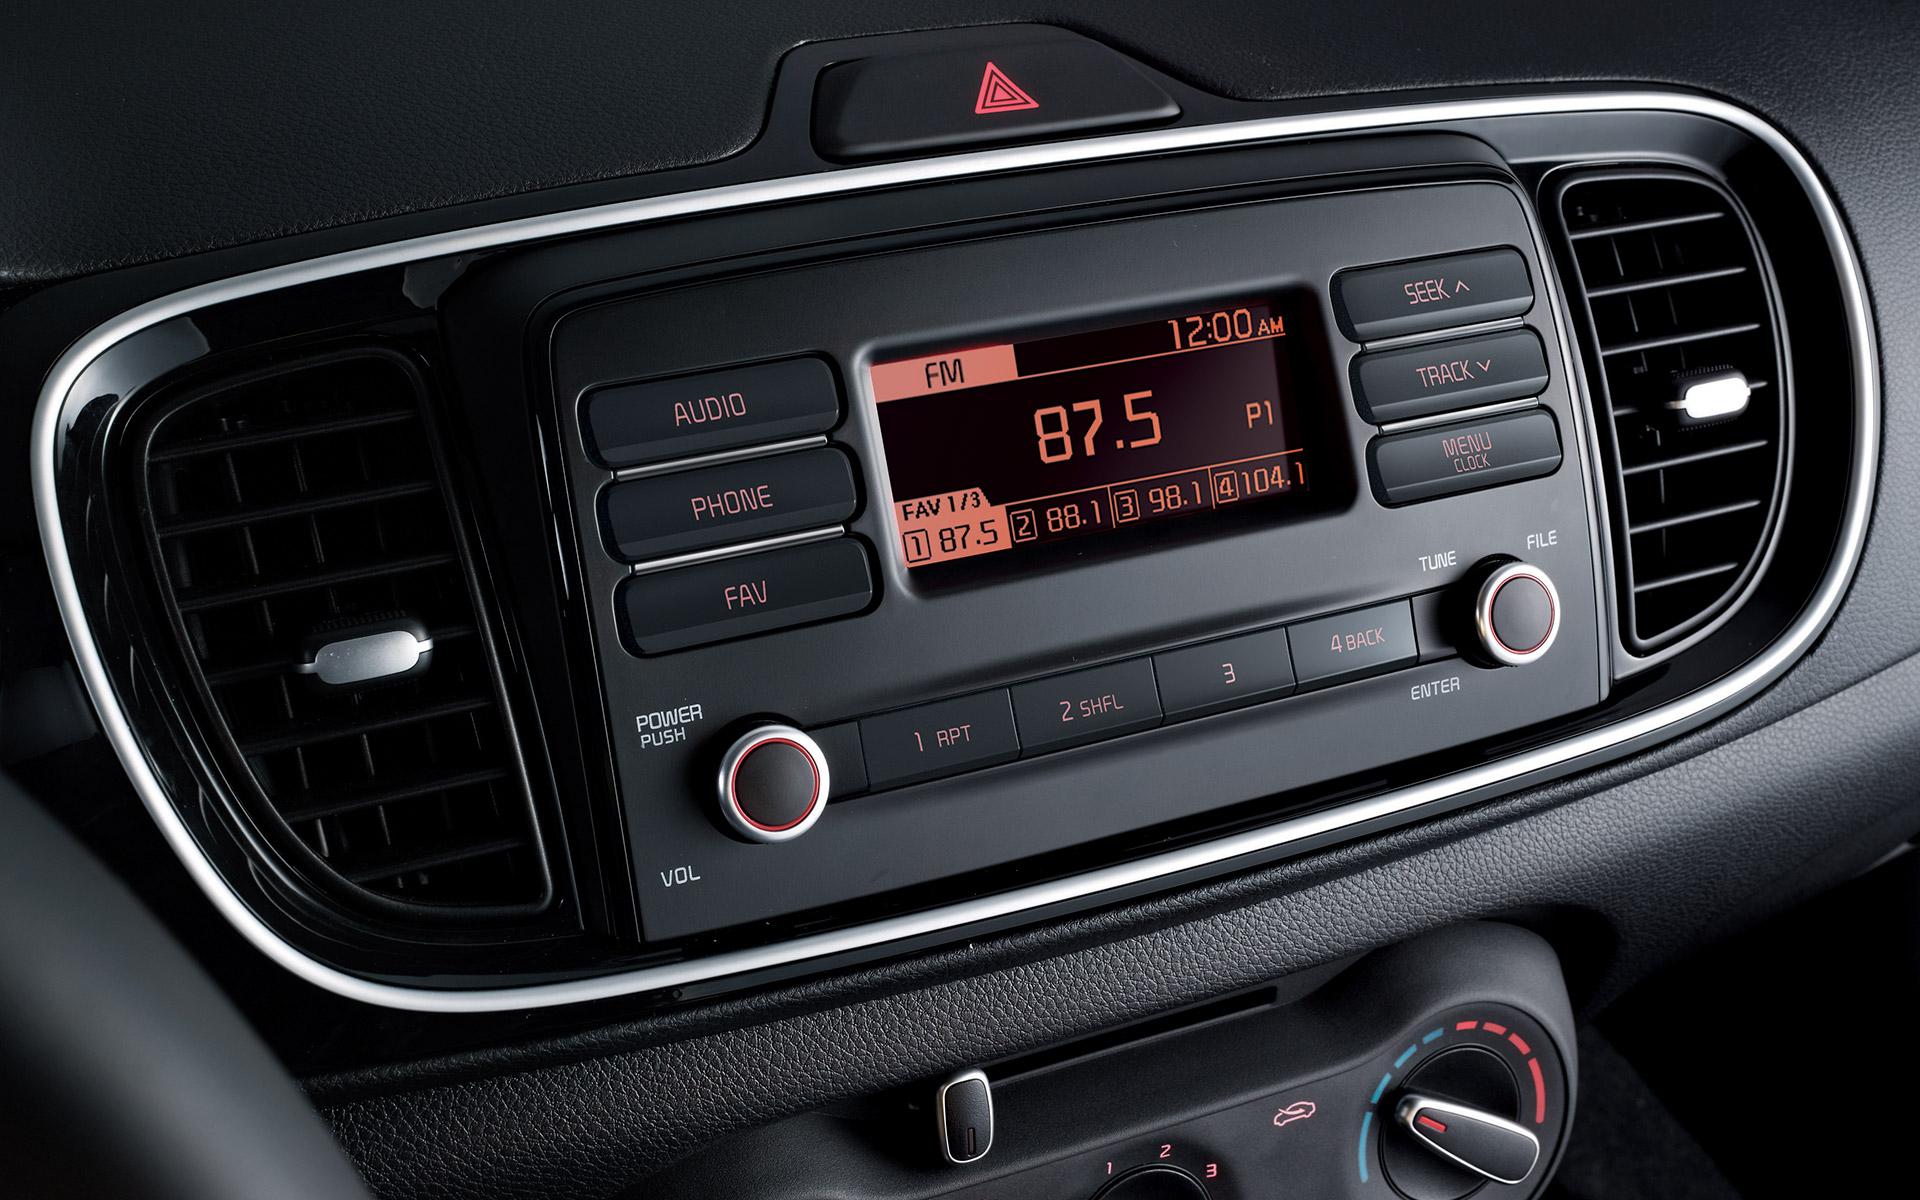 Compact Yet Spacious Kia Pegas Sedan To Be Sold In The Uae For The First Time Godubai Com